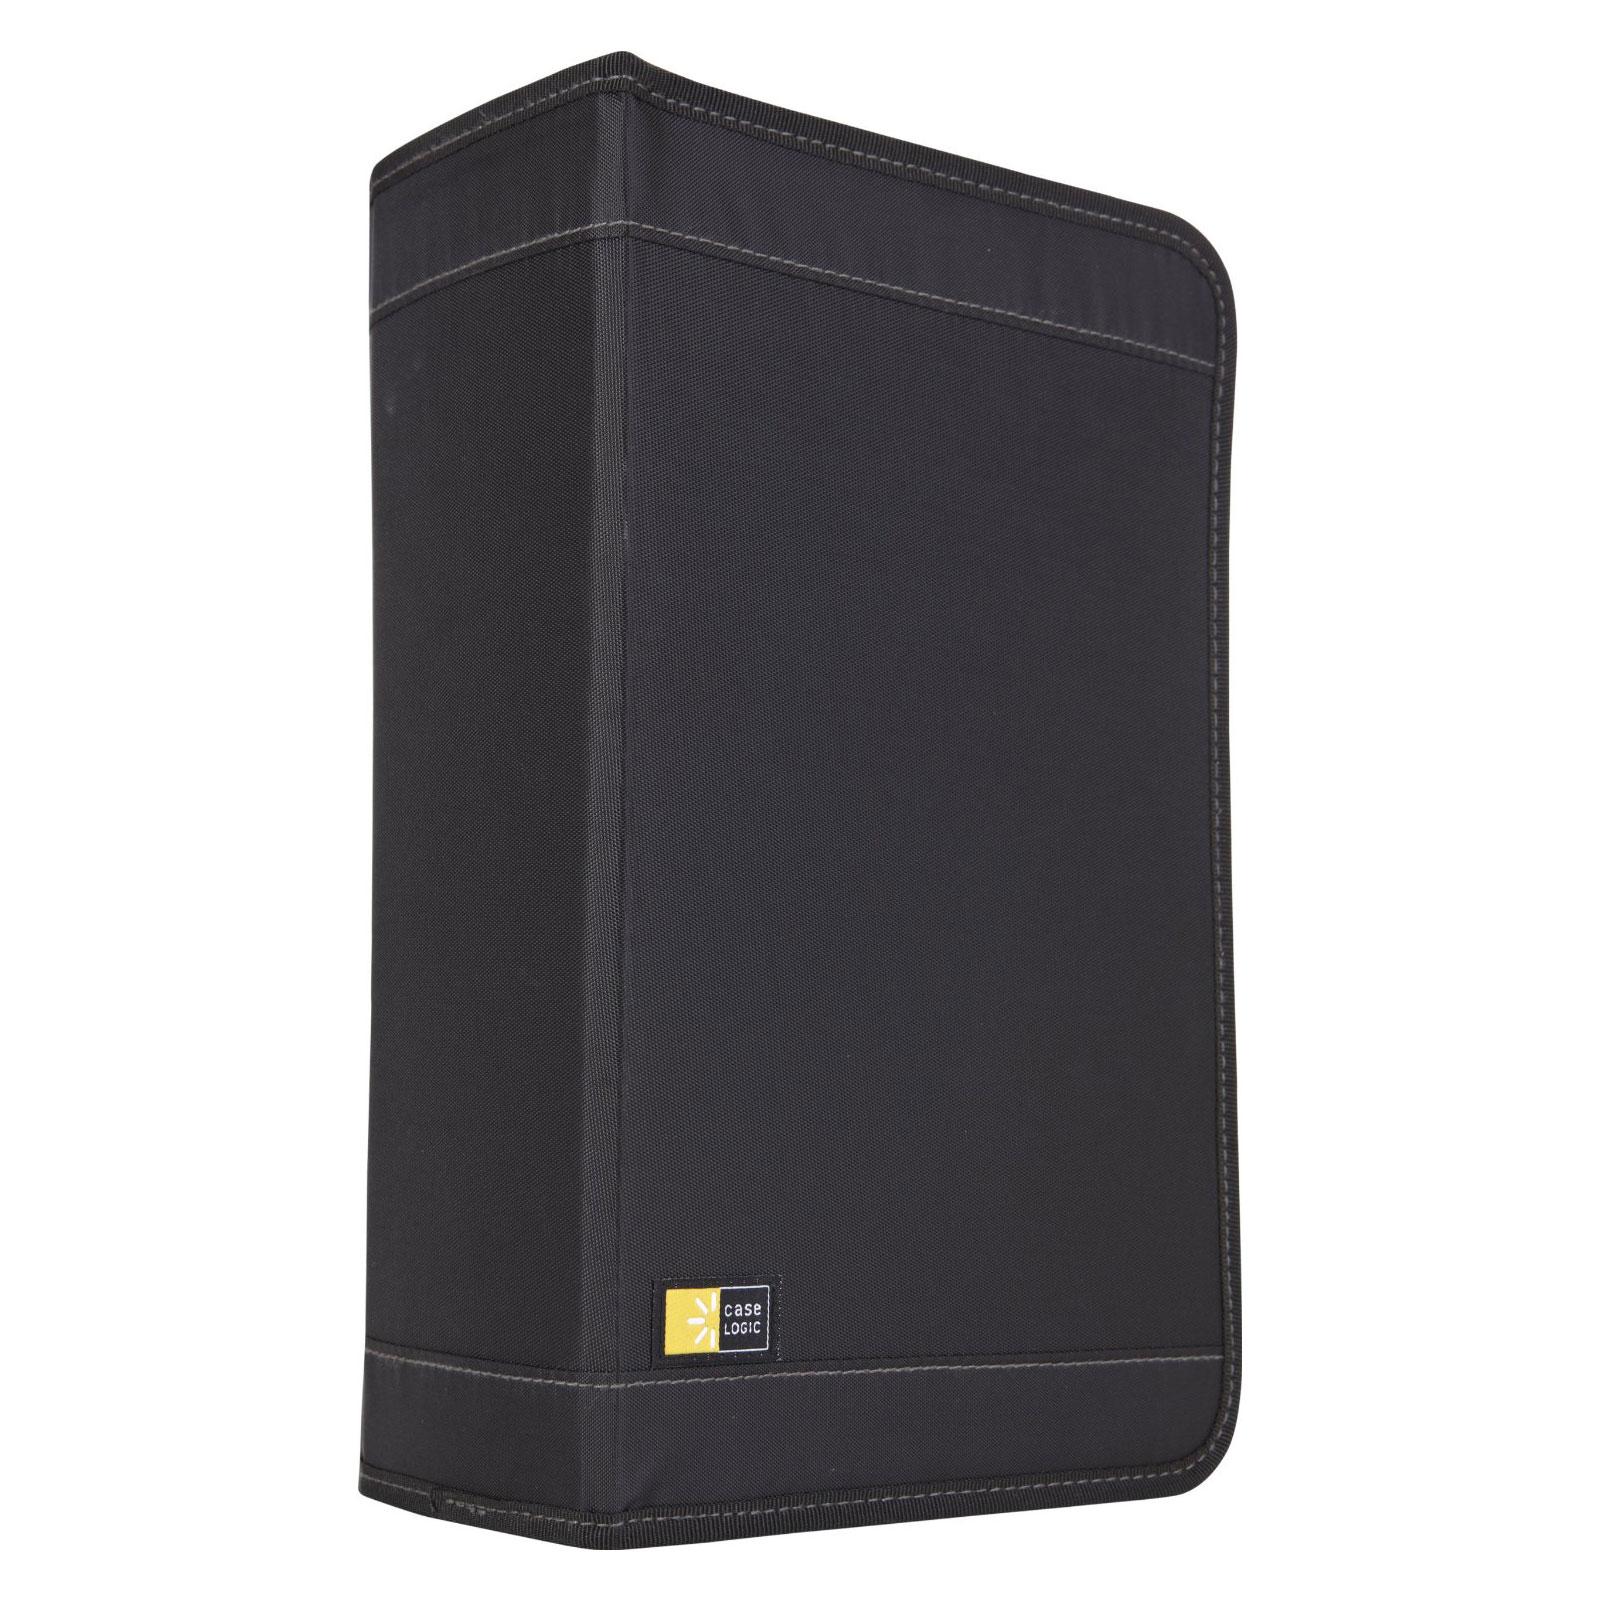 Pochette CD / DVD Case Logic CDW-128 Etui de rangement pour 128 CD/DVD/BD